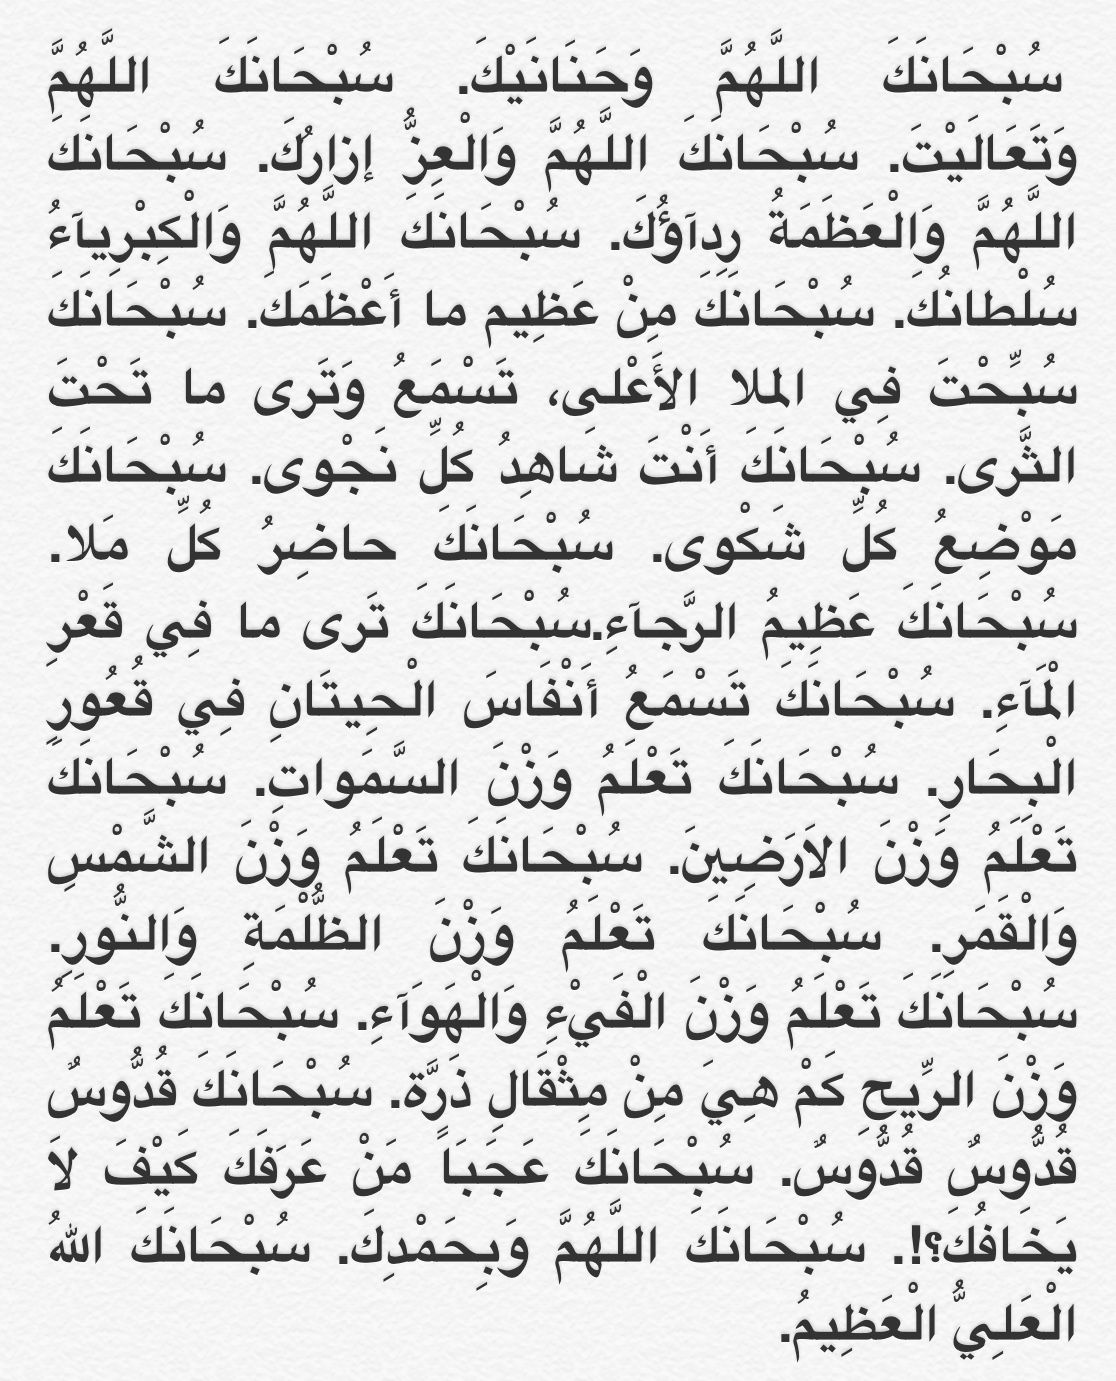 Pin By Adnan Ali On Duaa Duaa Islam Qoutes Islam